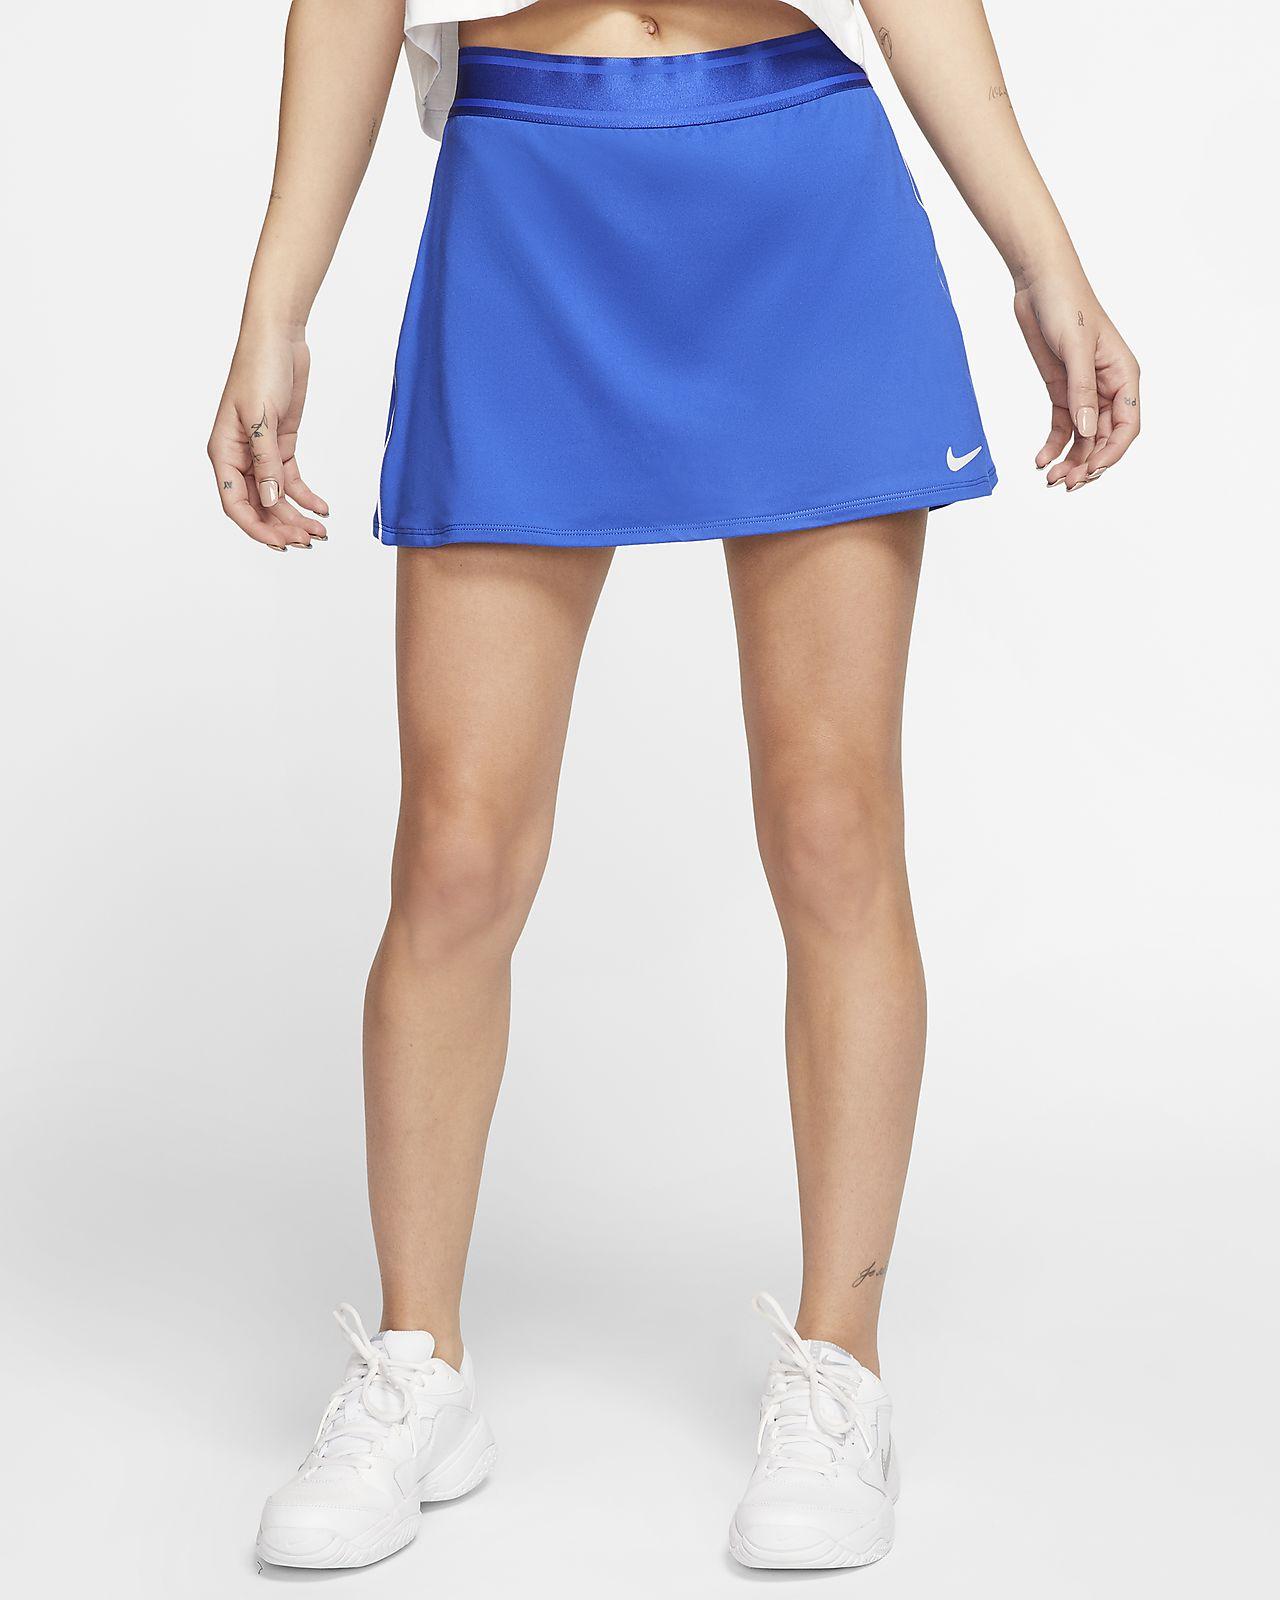 NikeCourt Dri FIT Women's Tennis Skirt